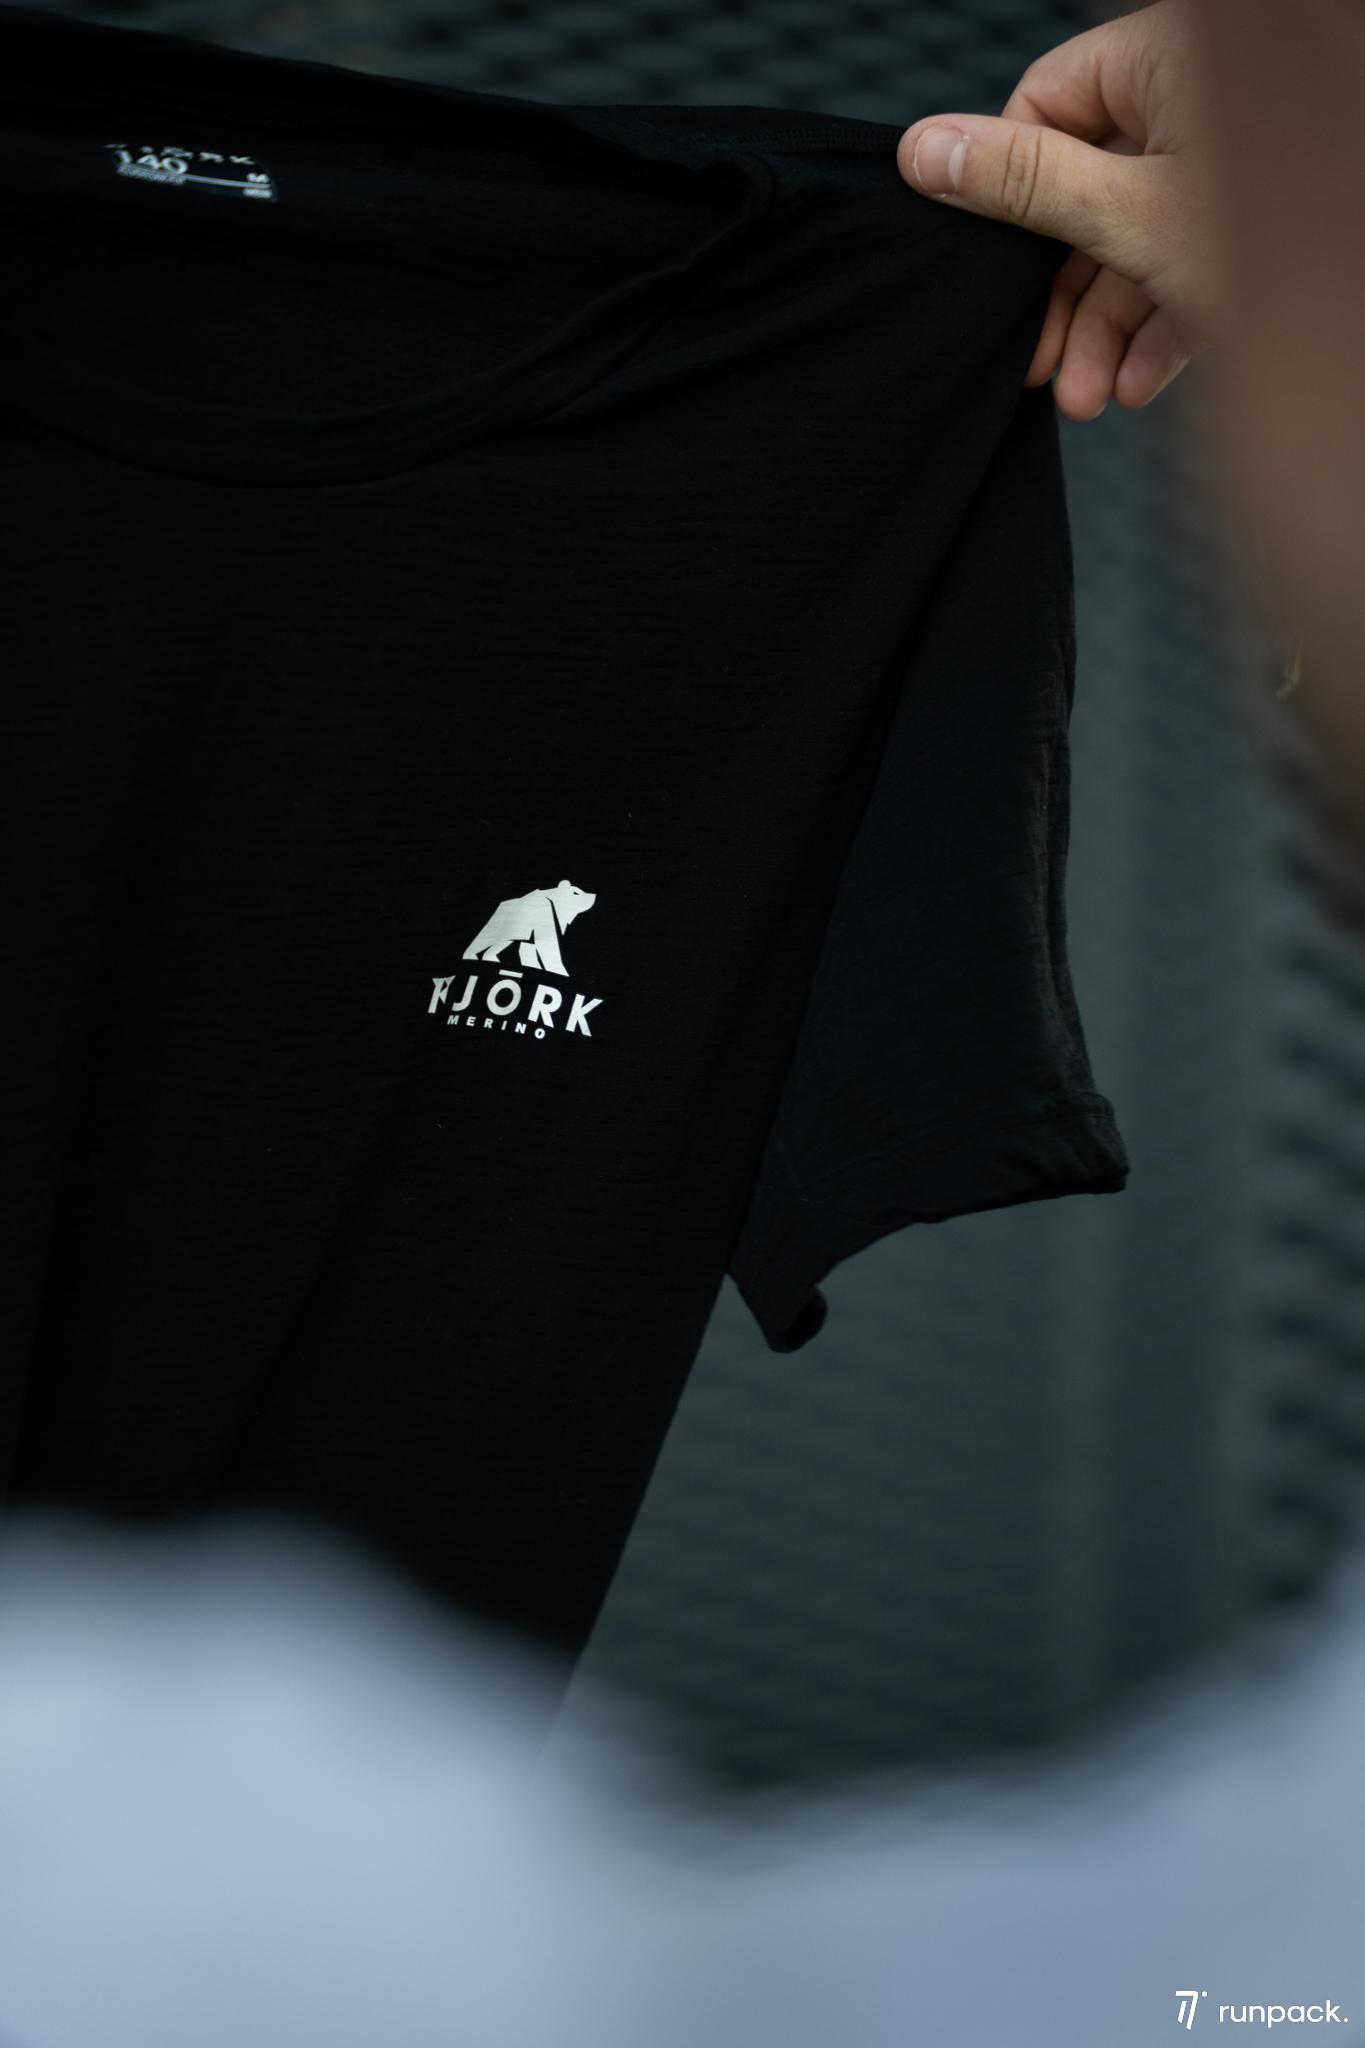 test tshirt fjork merinos runpack 5